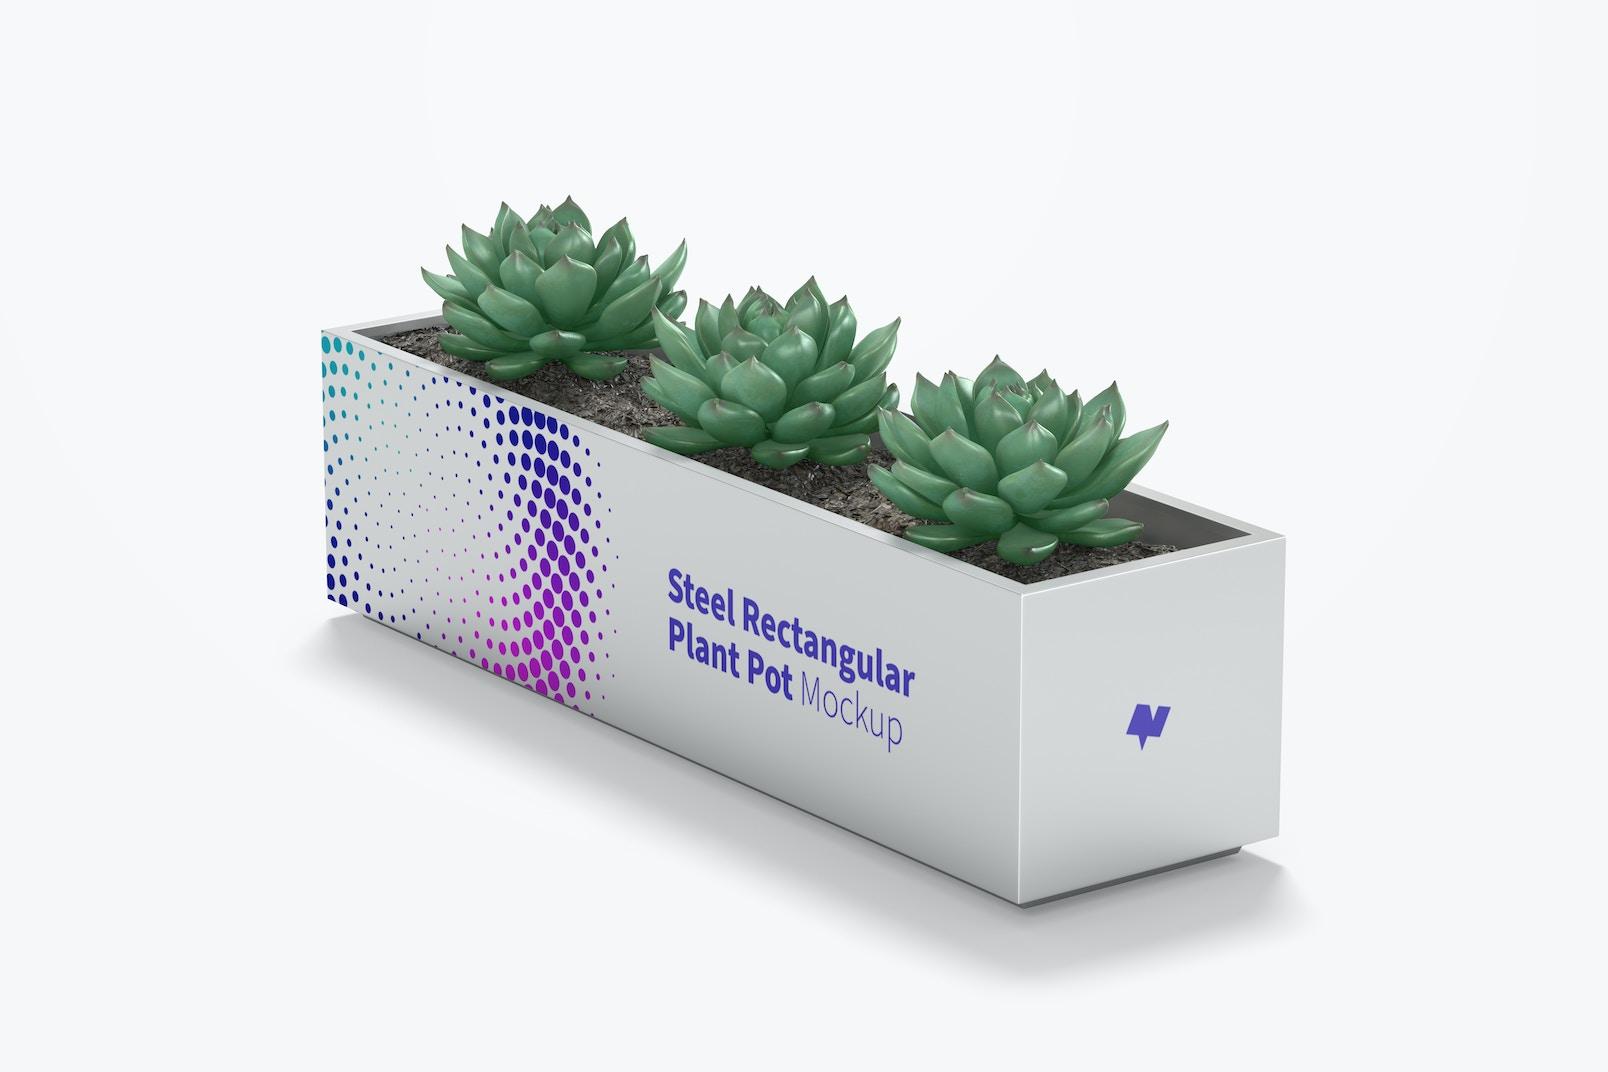 Steel Rectangular Plant Pot Mockup